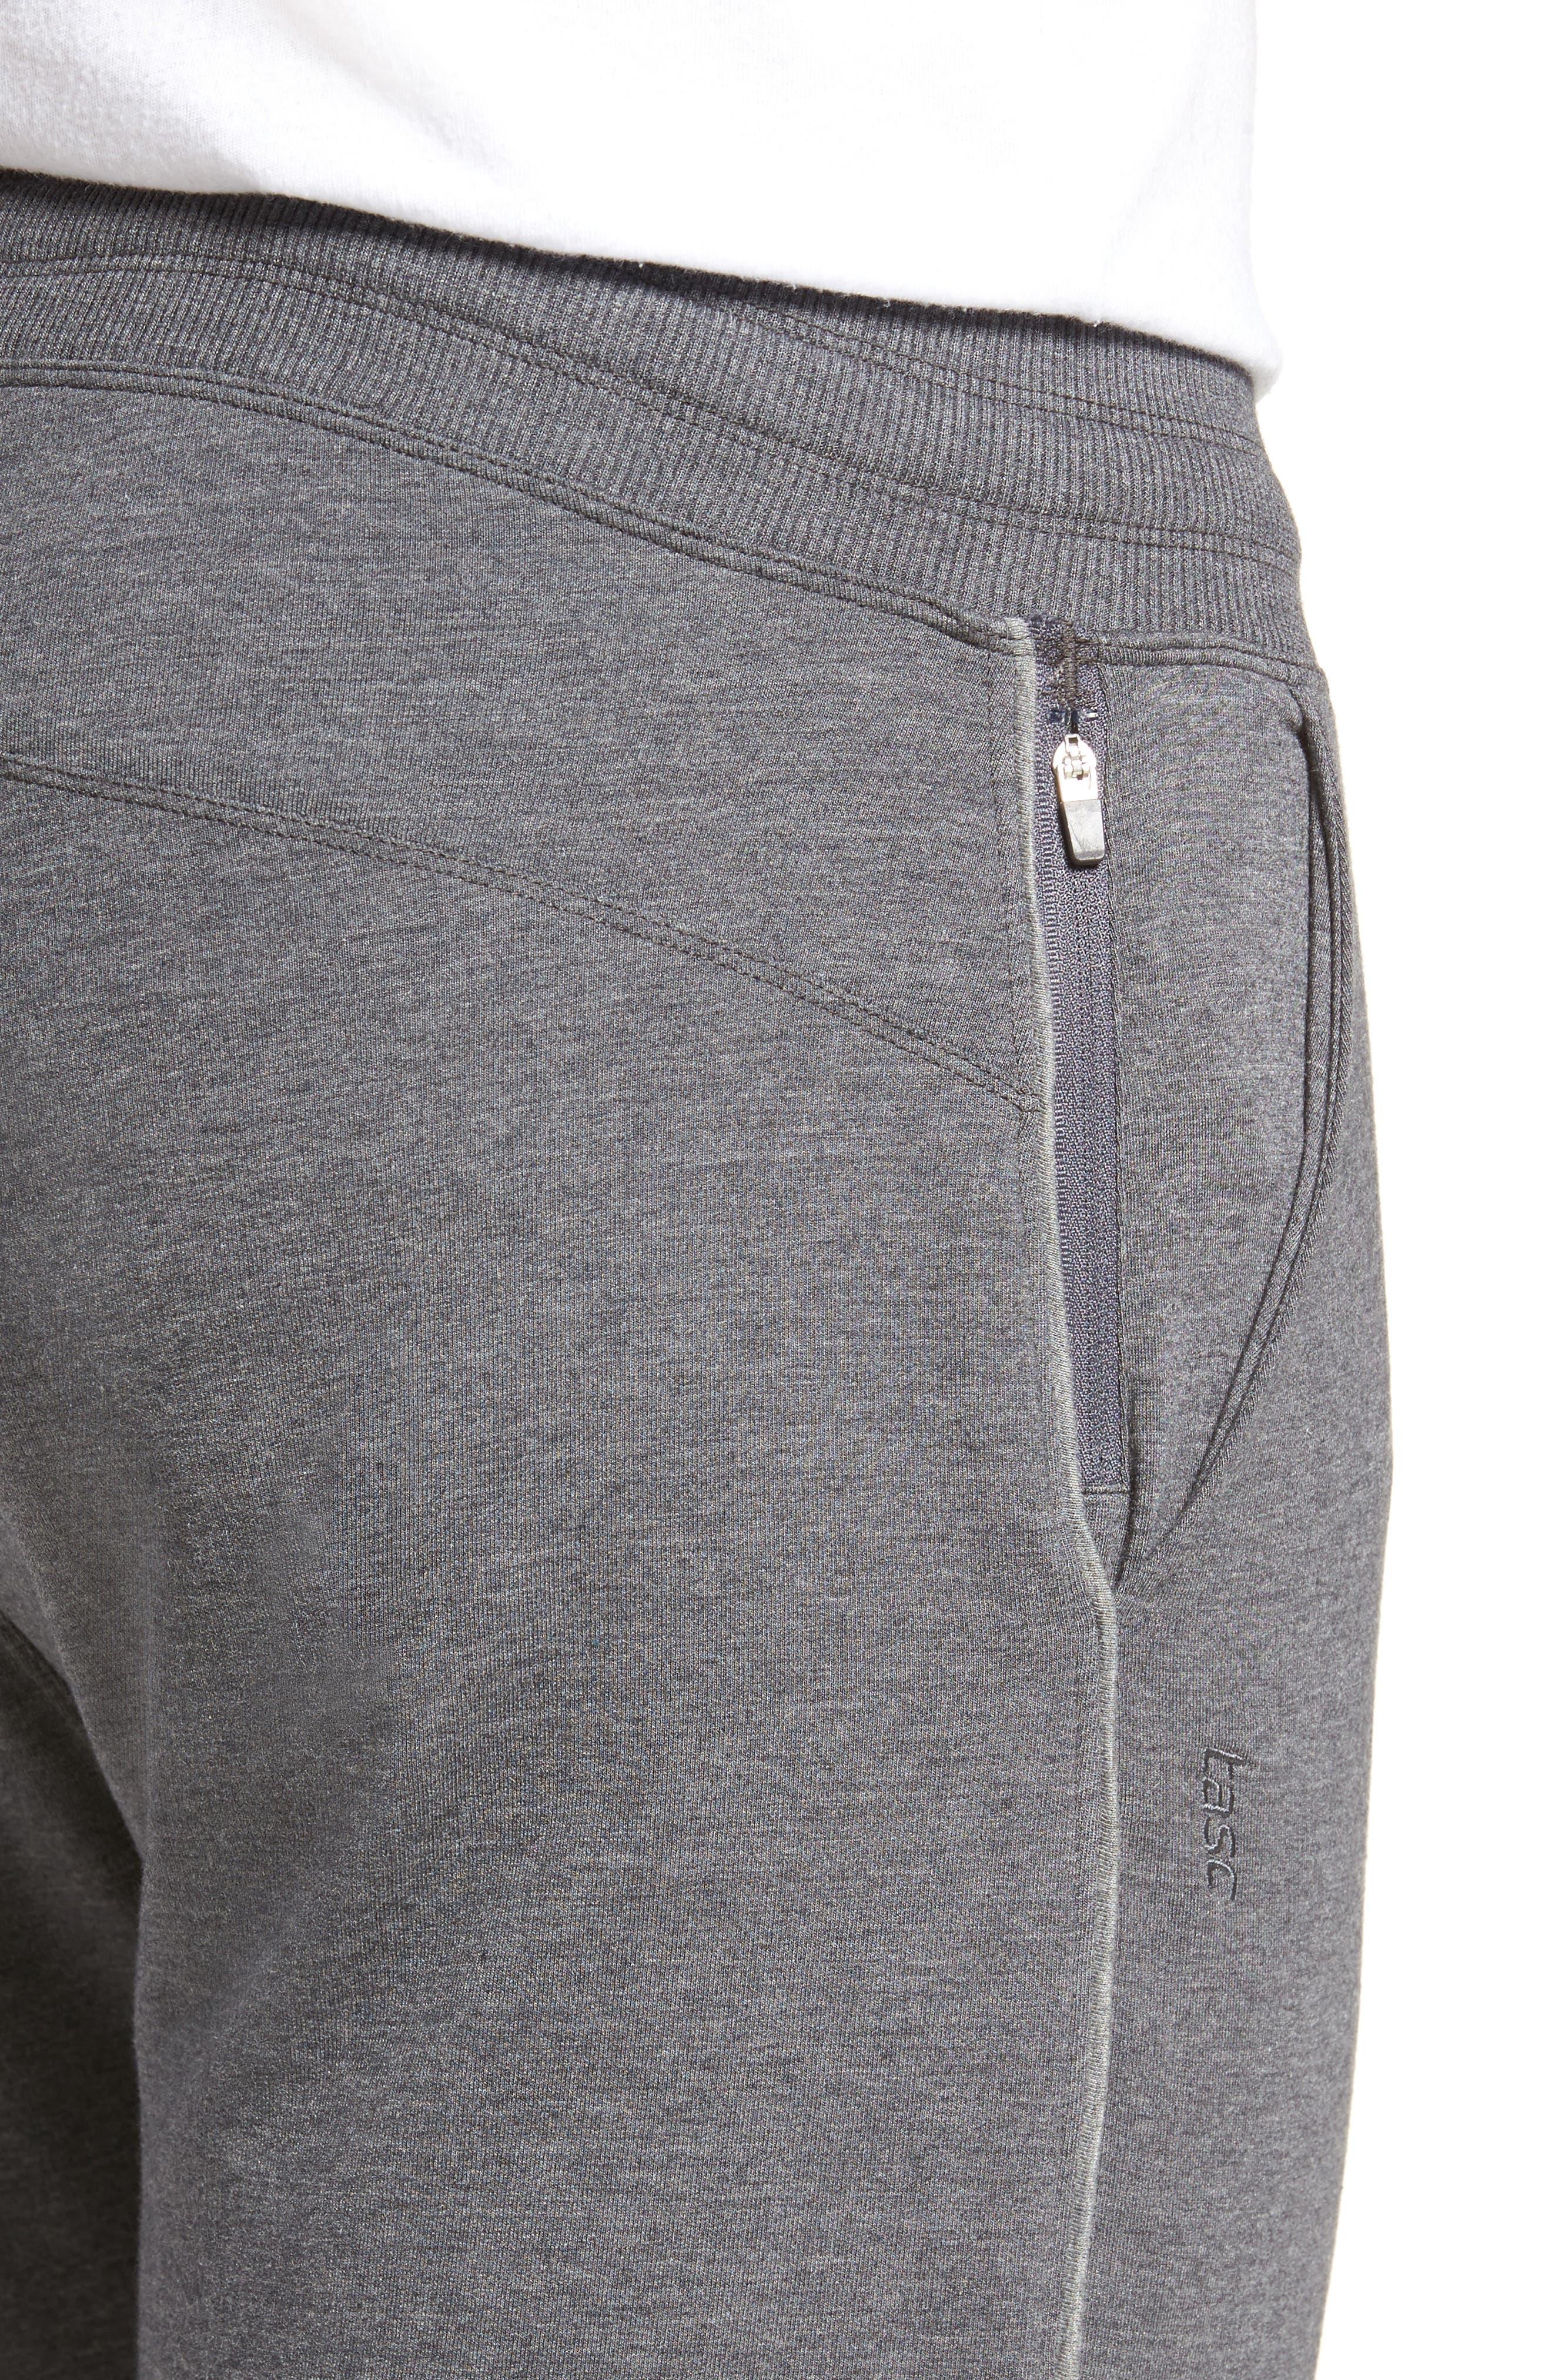 Legacy Sweatpants,                             Alternate thumbnail 4, color,                             Black Heather